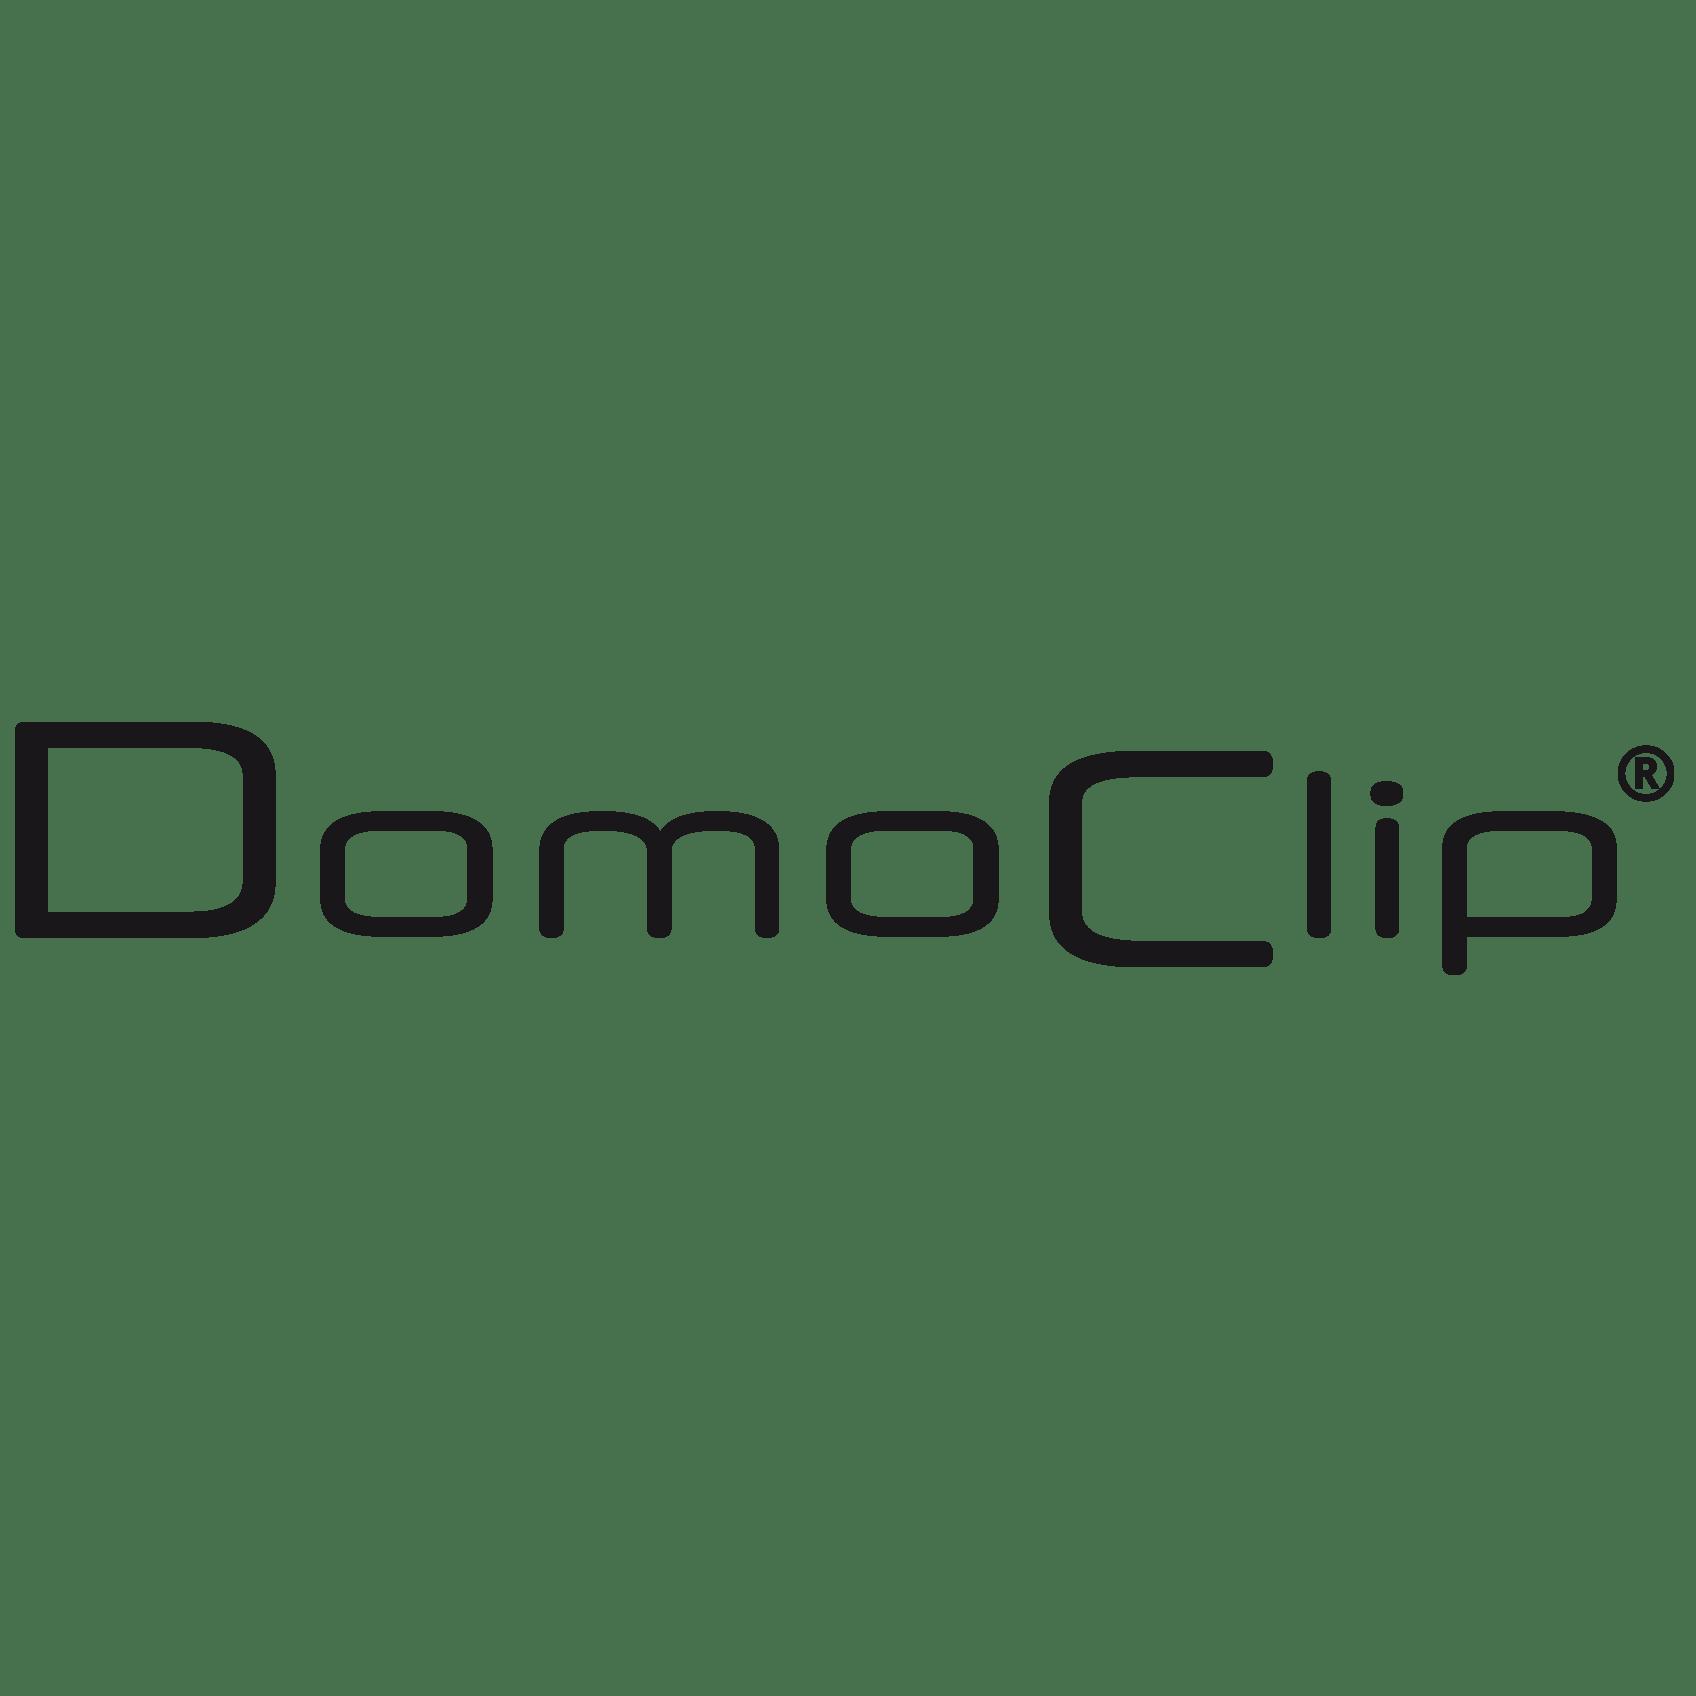 Comment contacter Domoclip ?